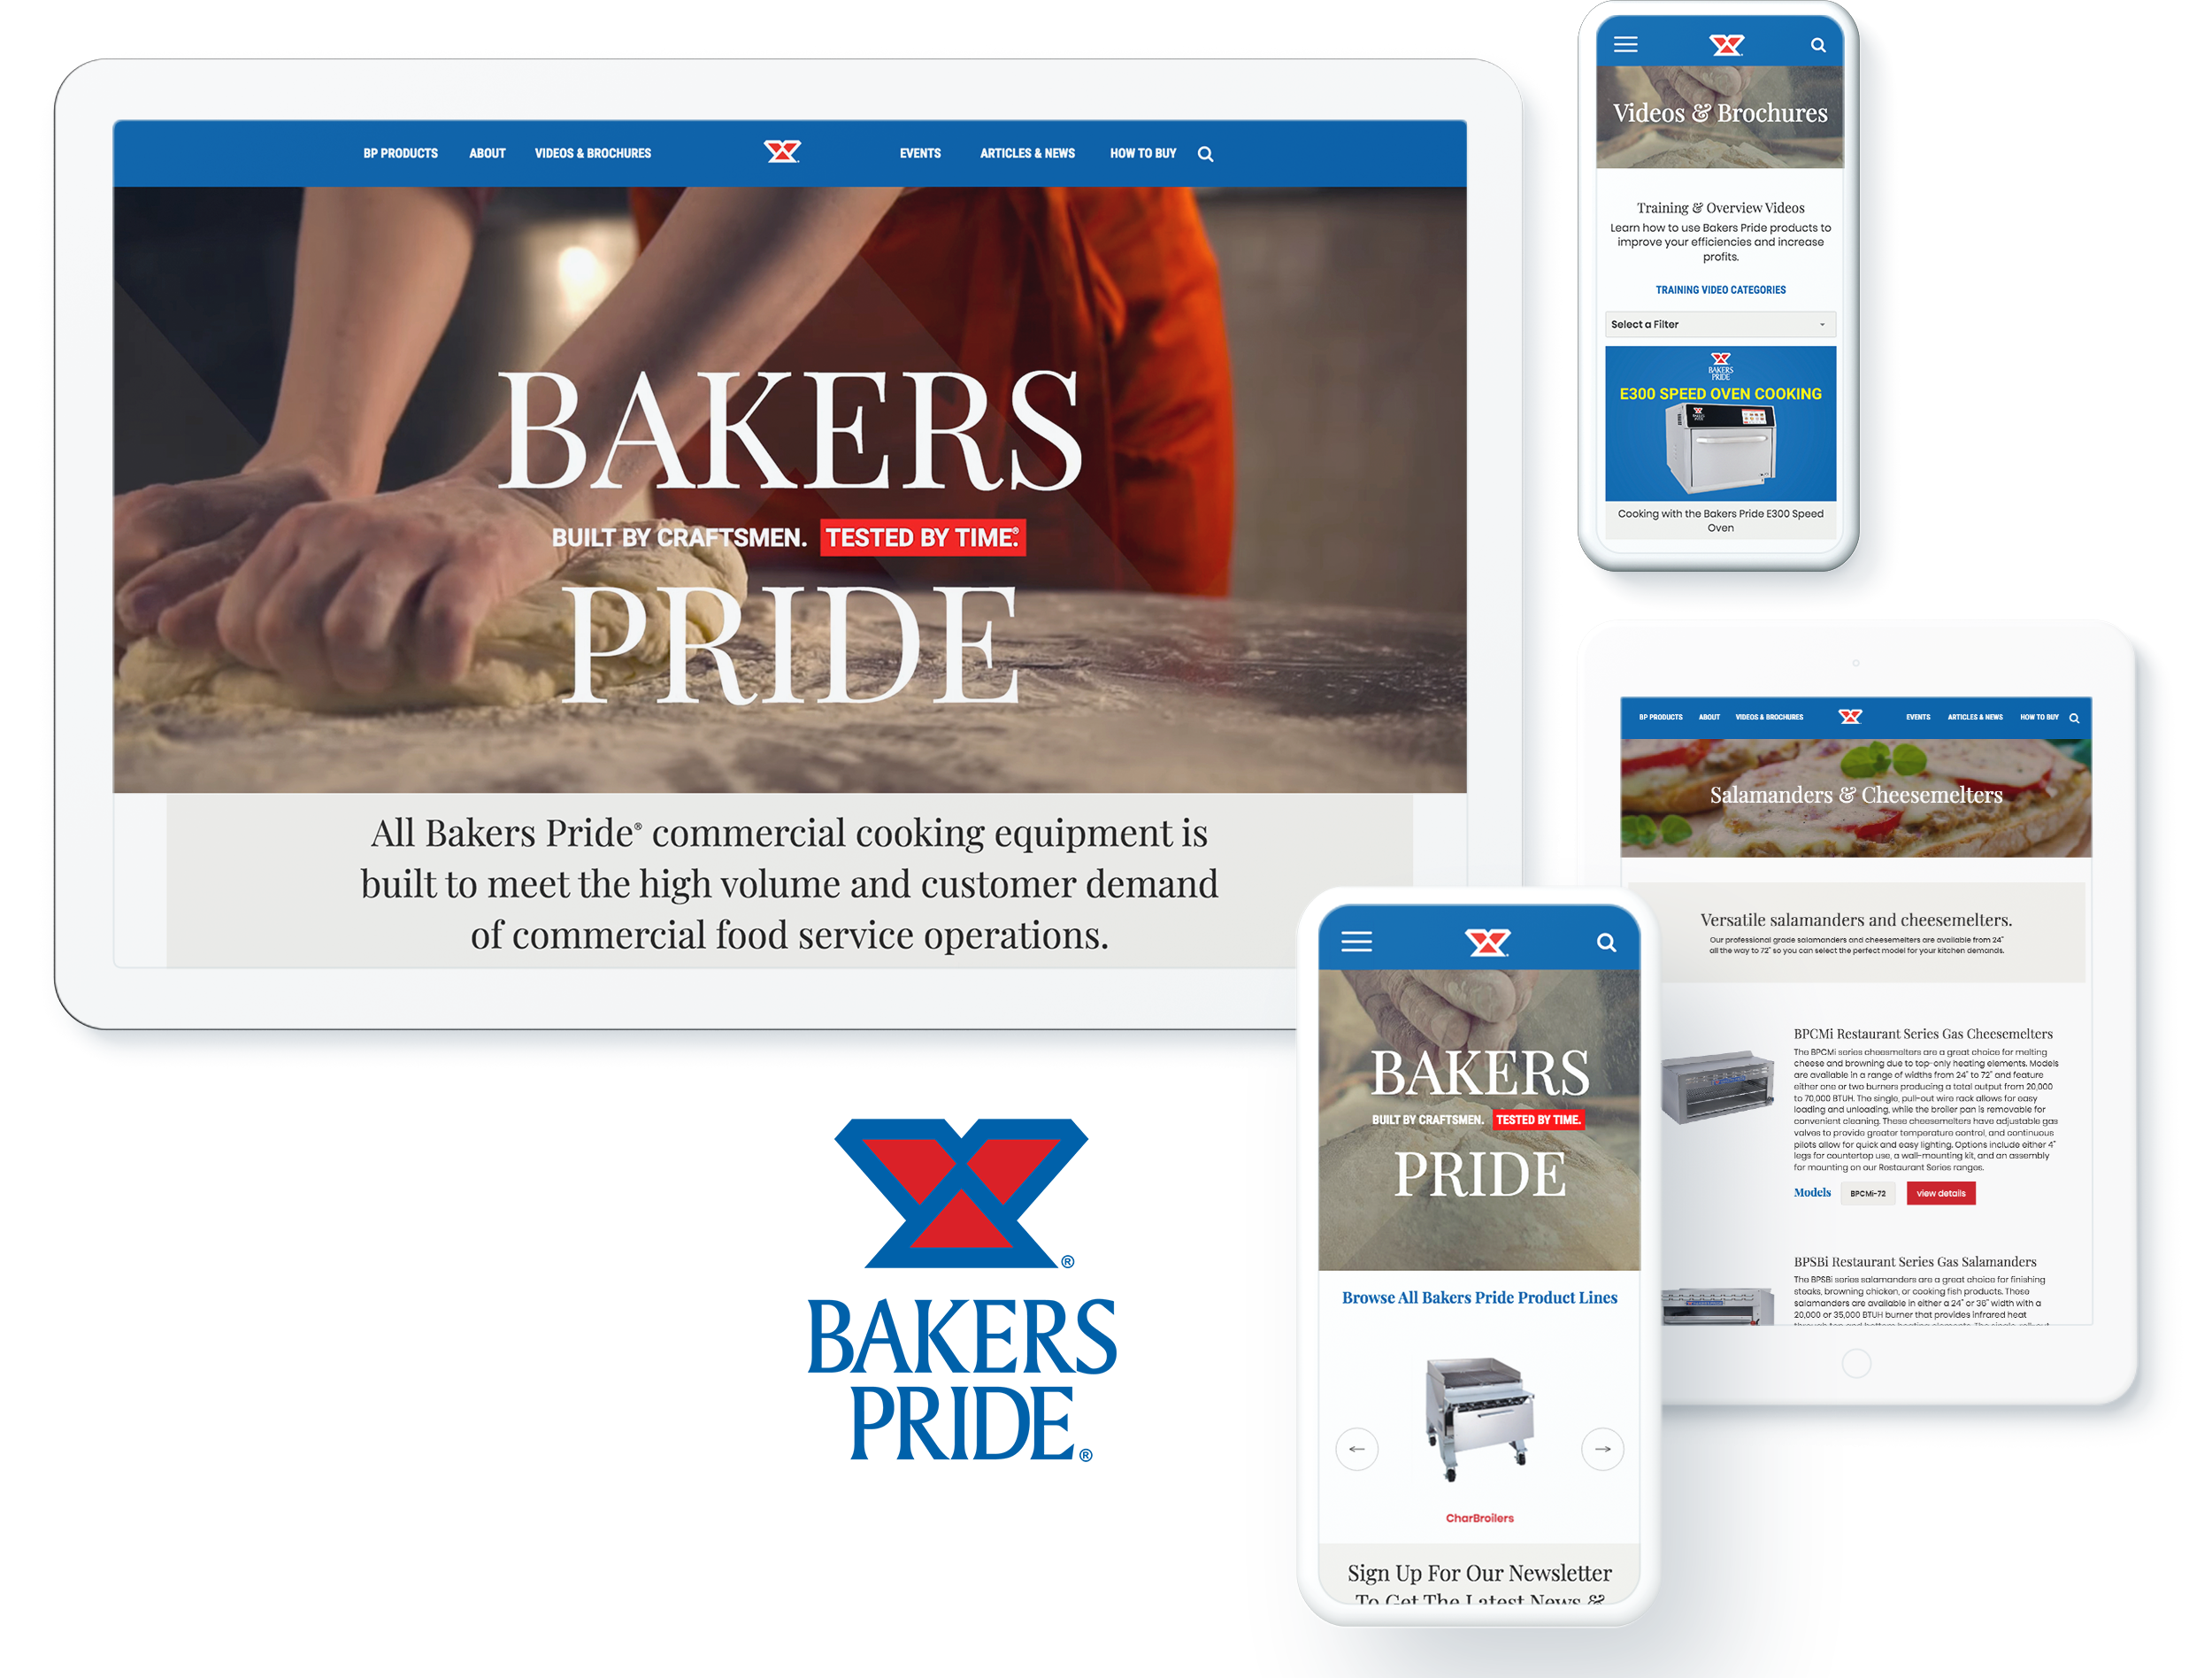 Baker'sPride